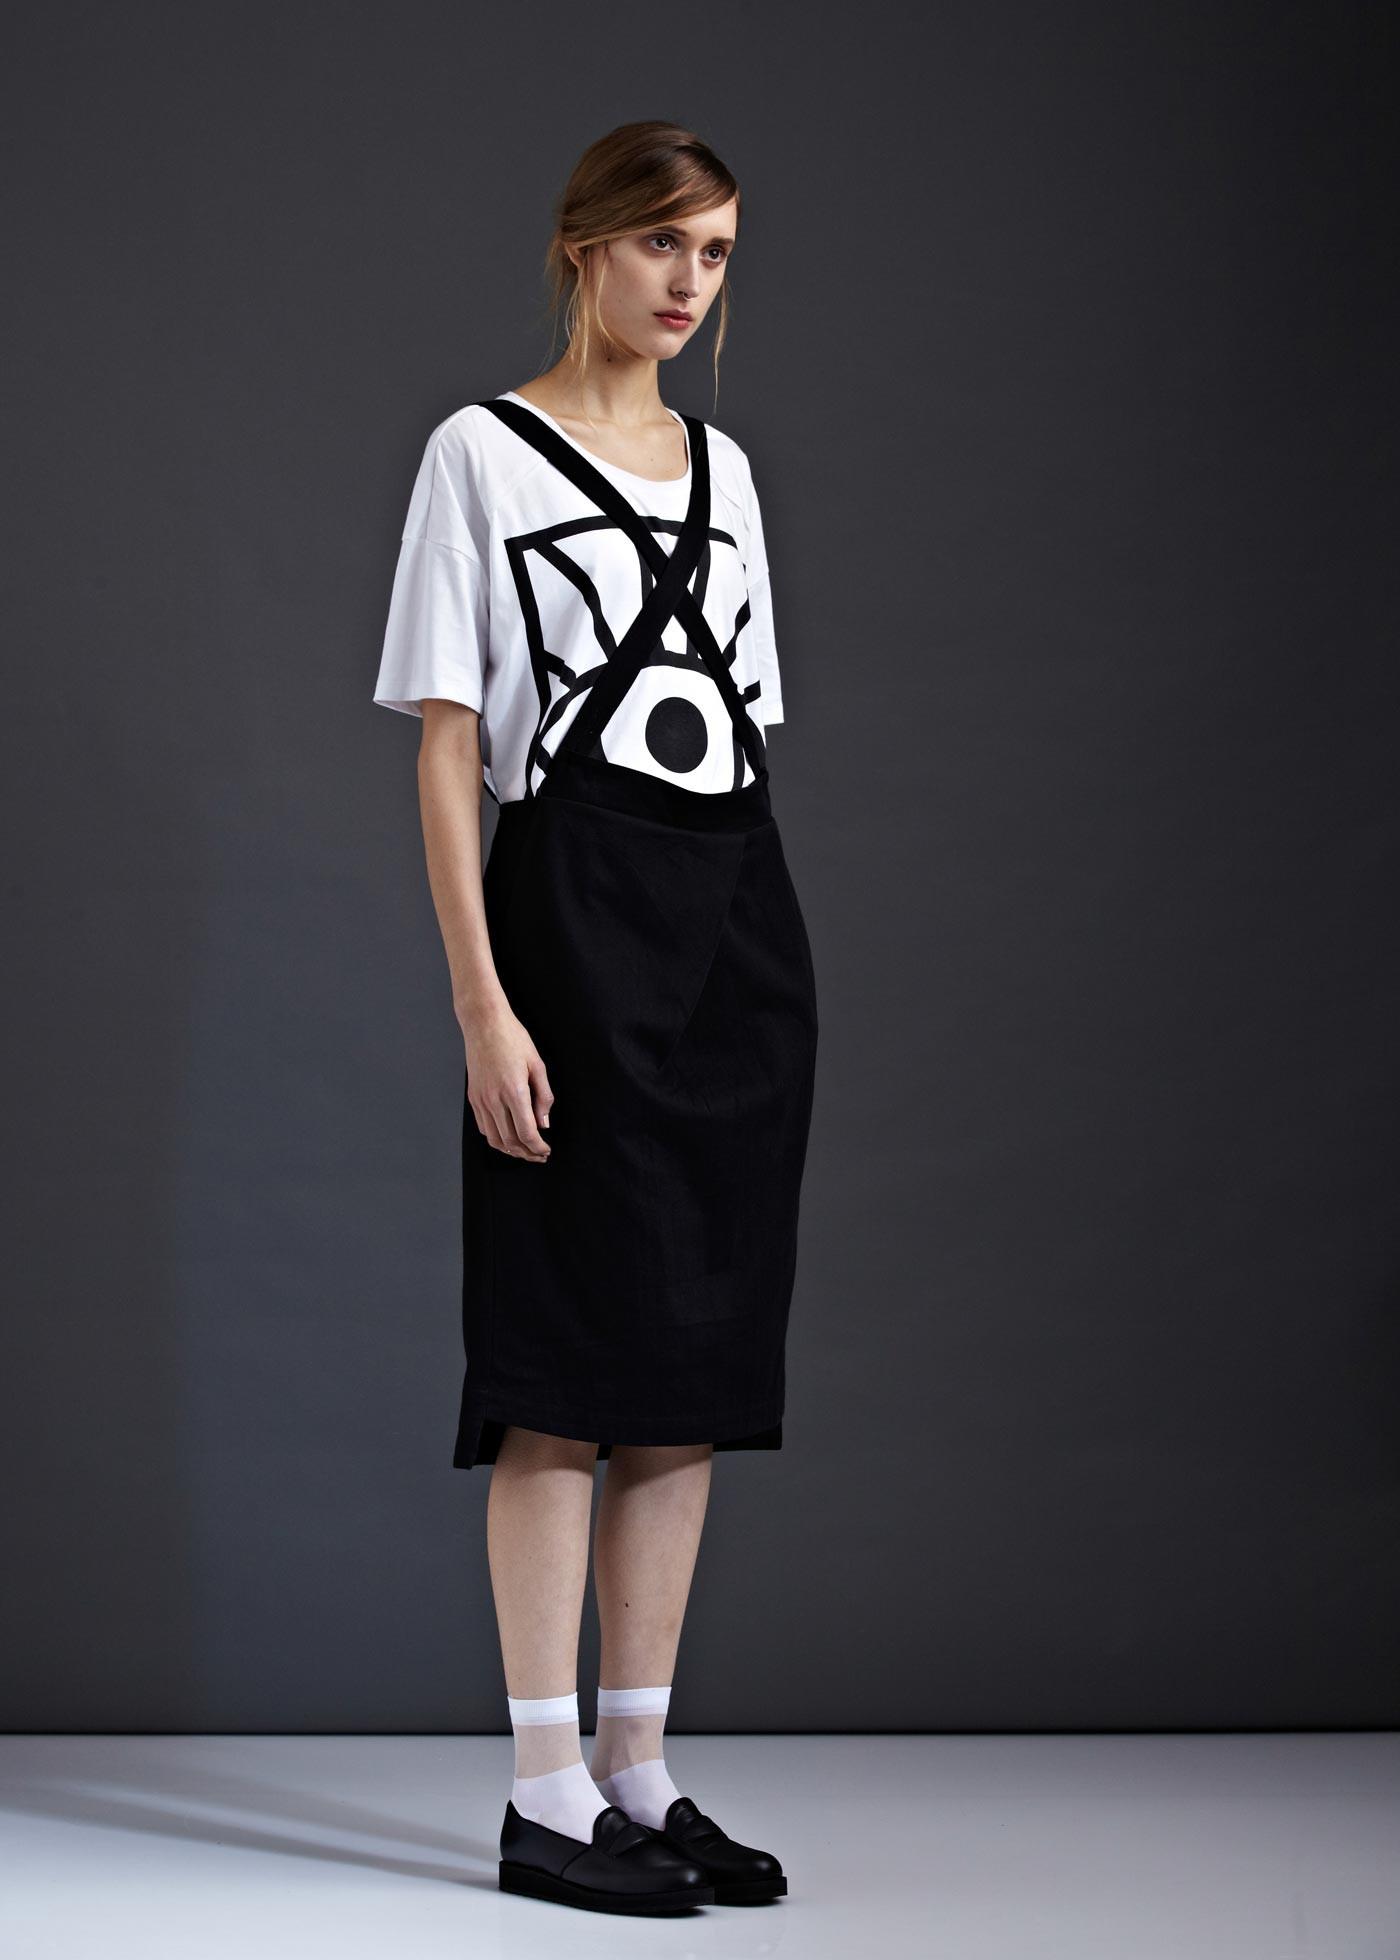 step-by-step-skirt-11_promo